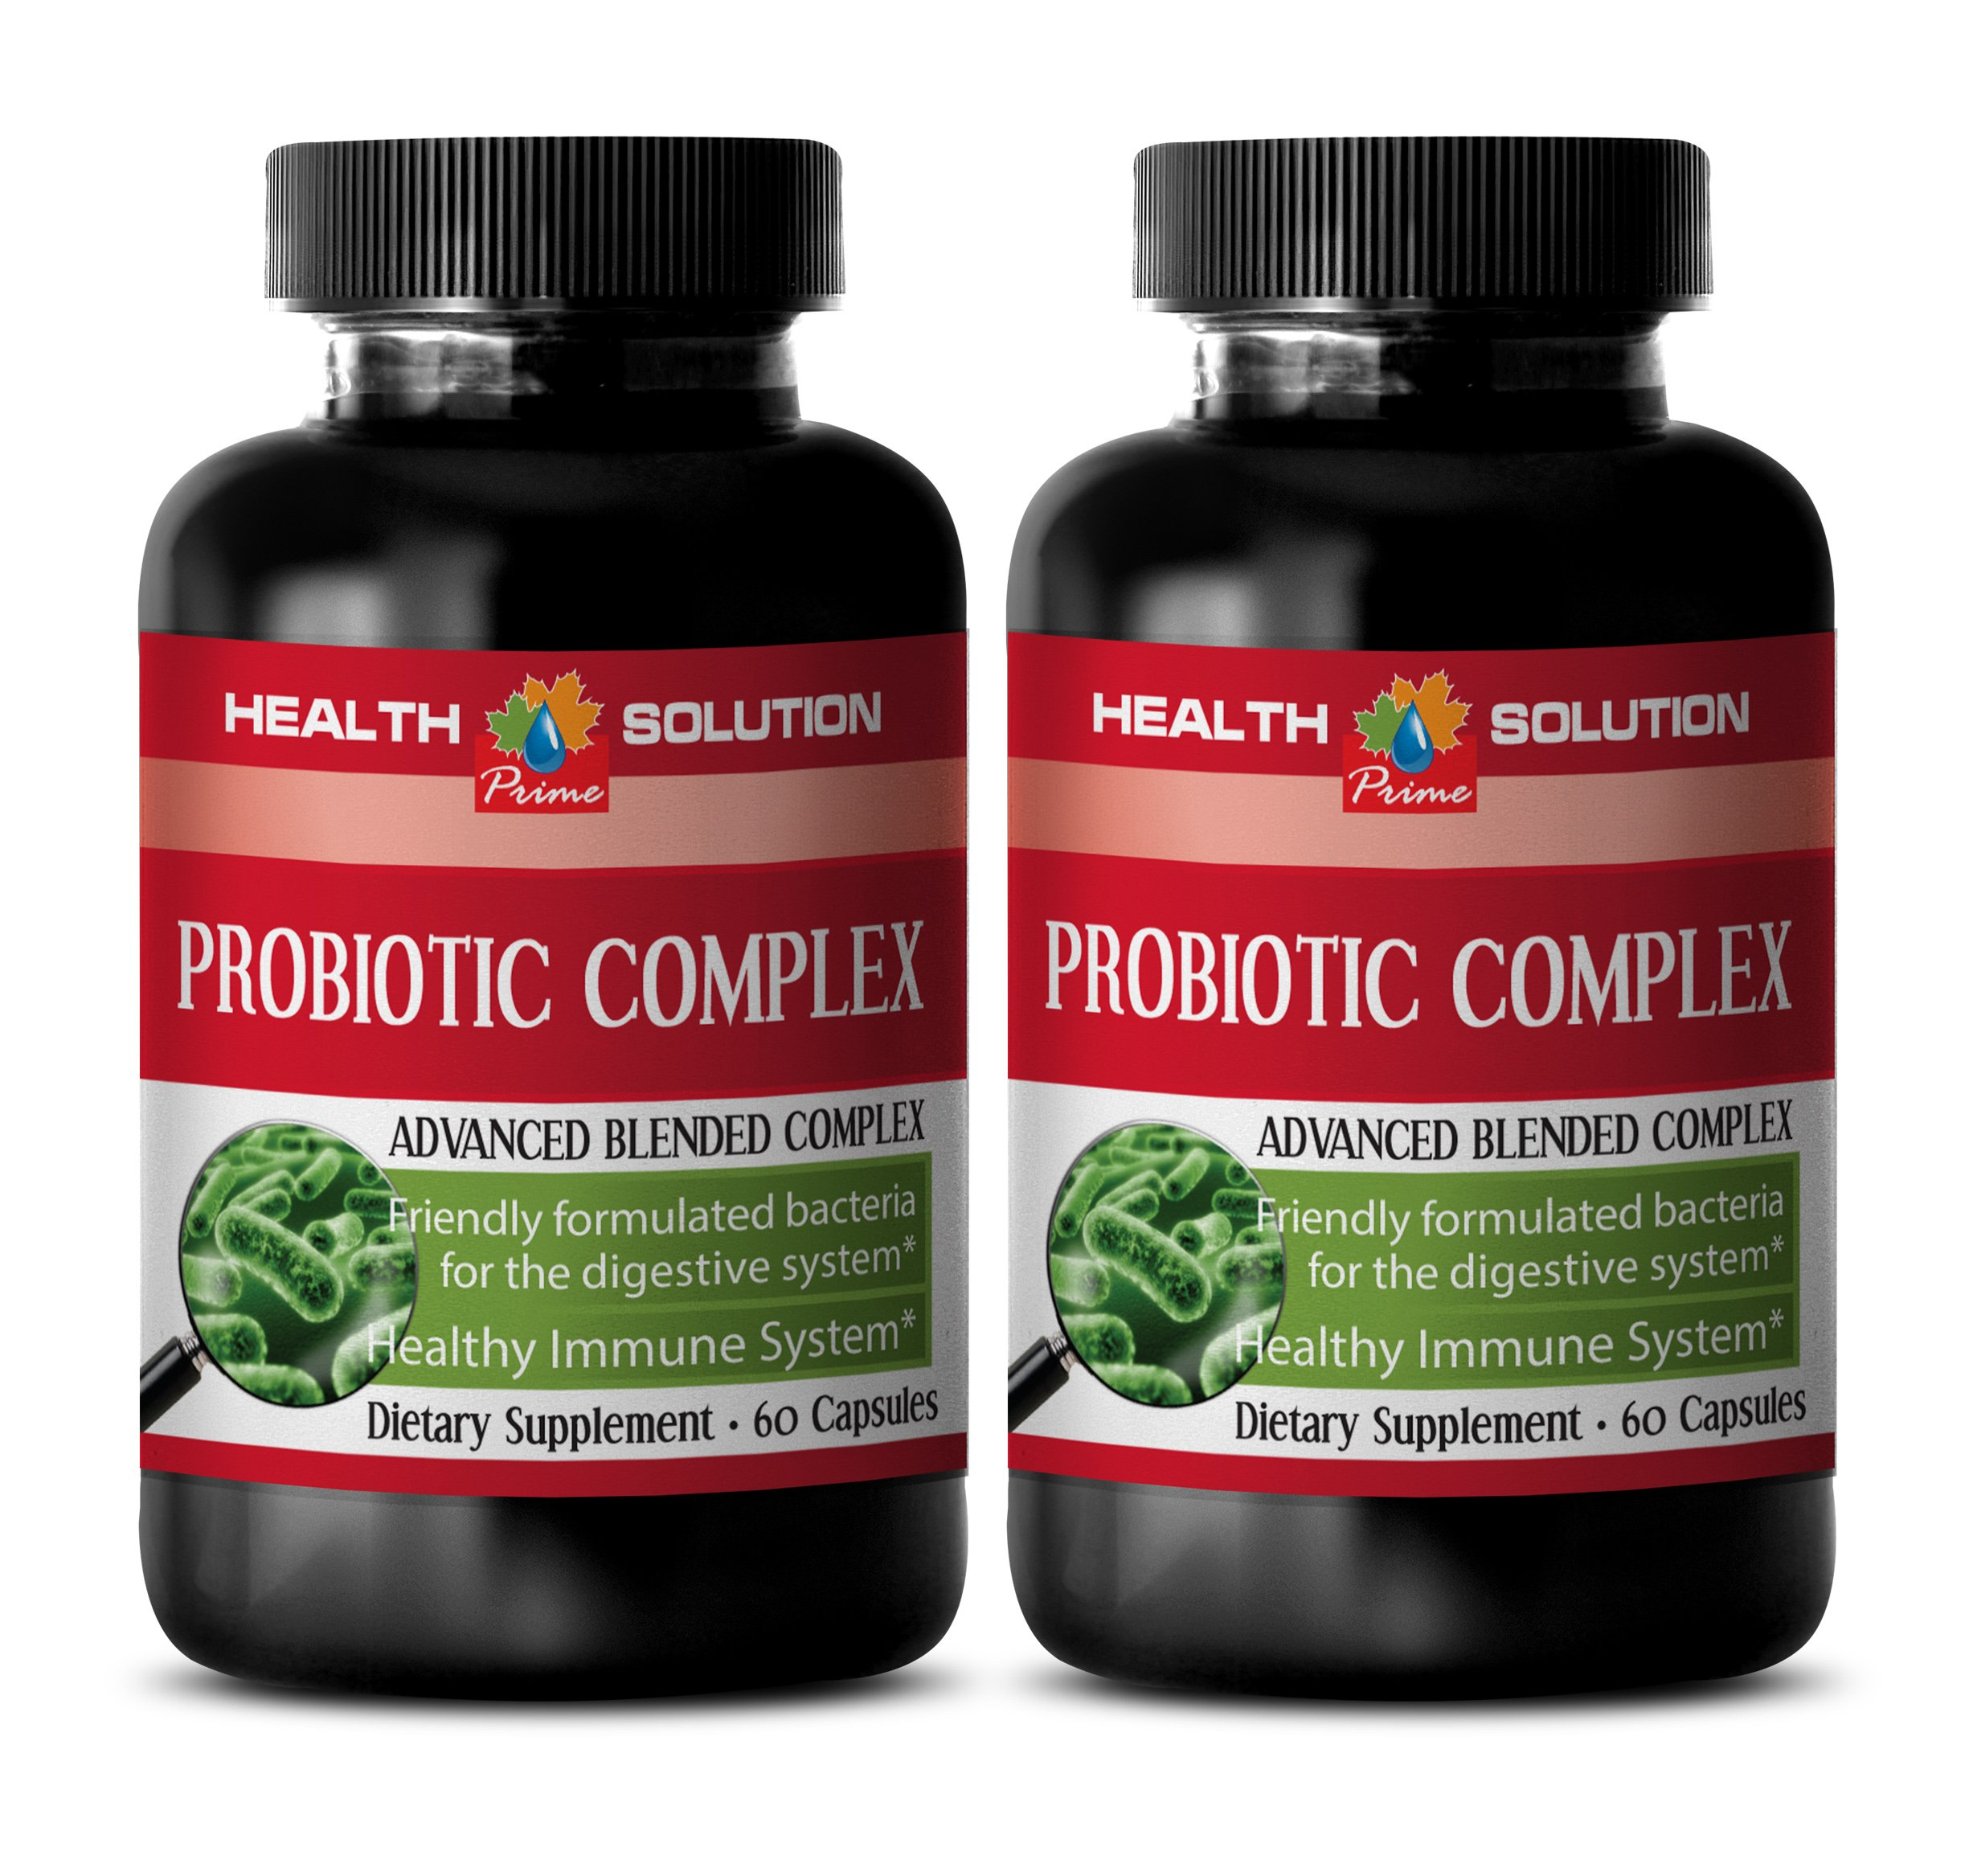 Probiotic capsules - PROBIOTIC COMPLEX 550MG - promote digestive function (2 Bottles)